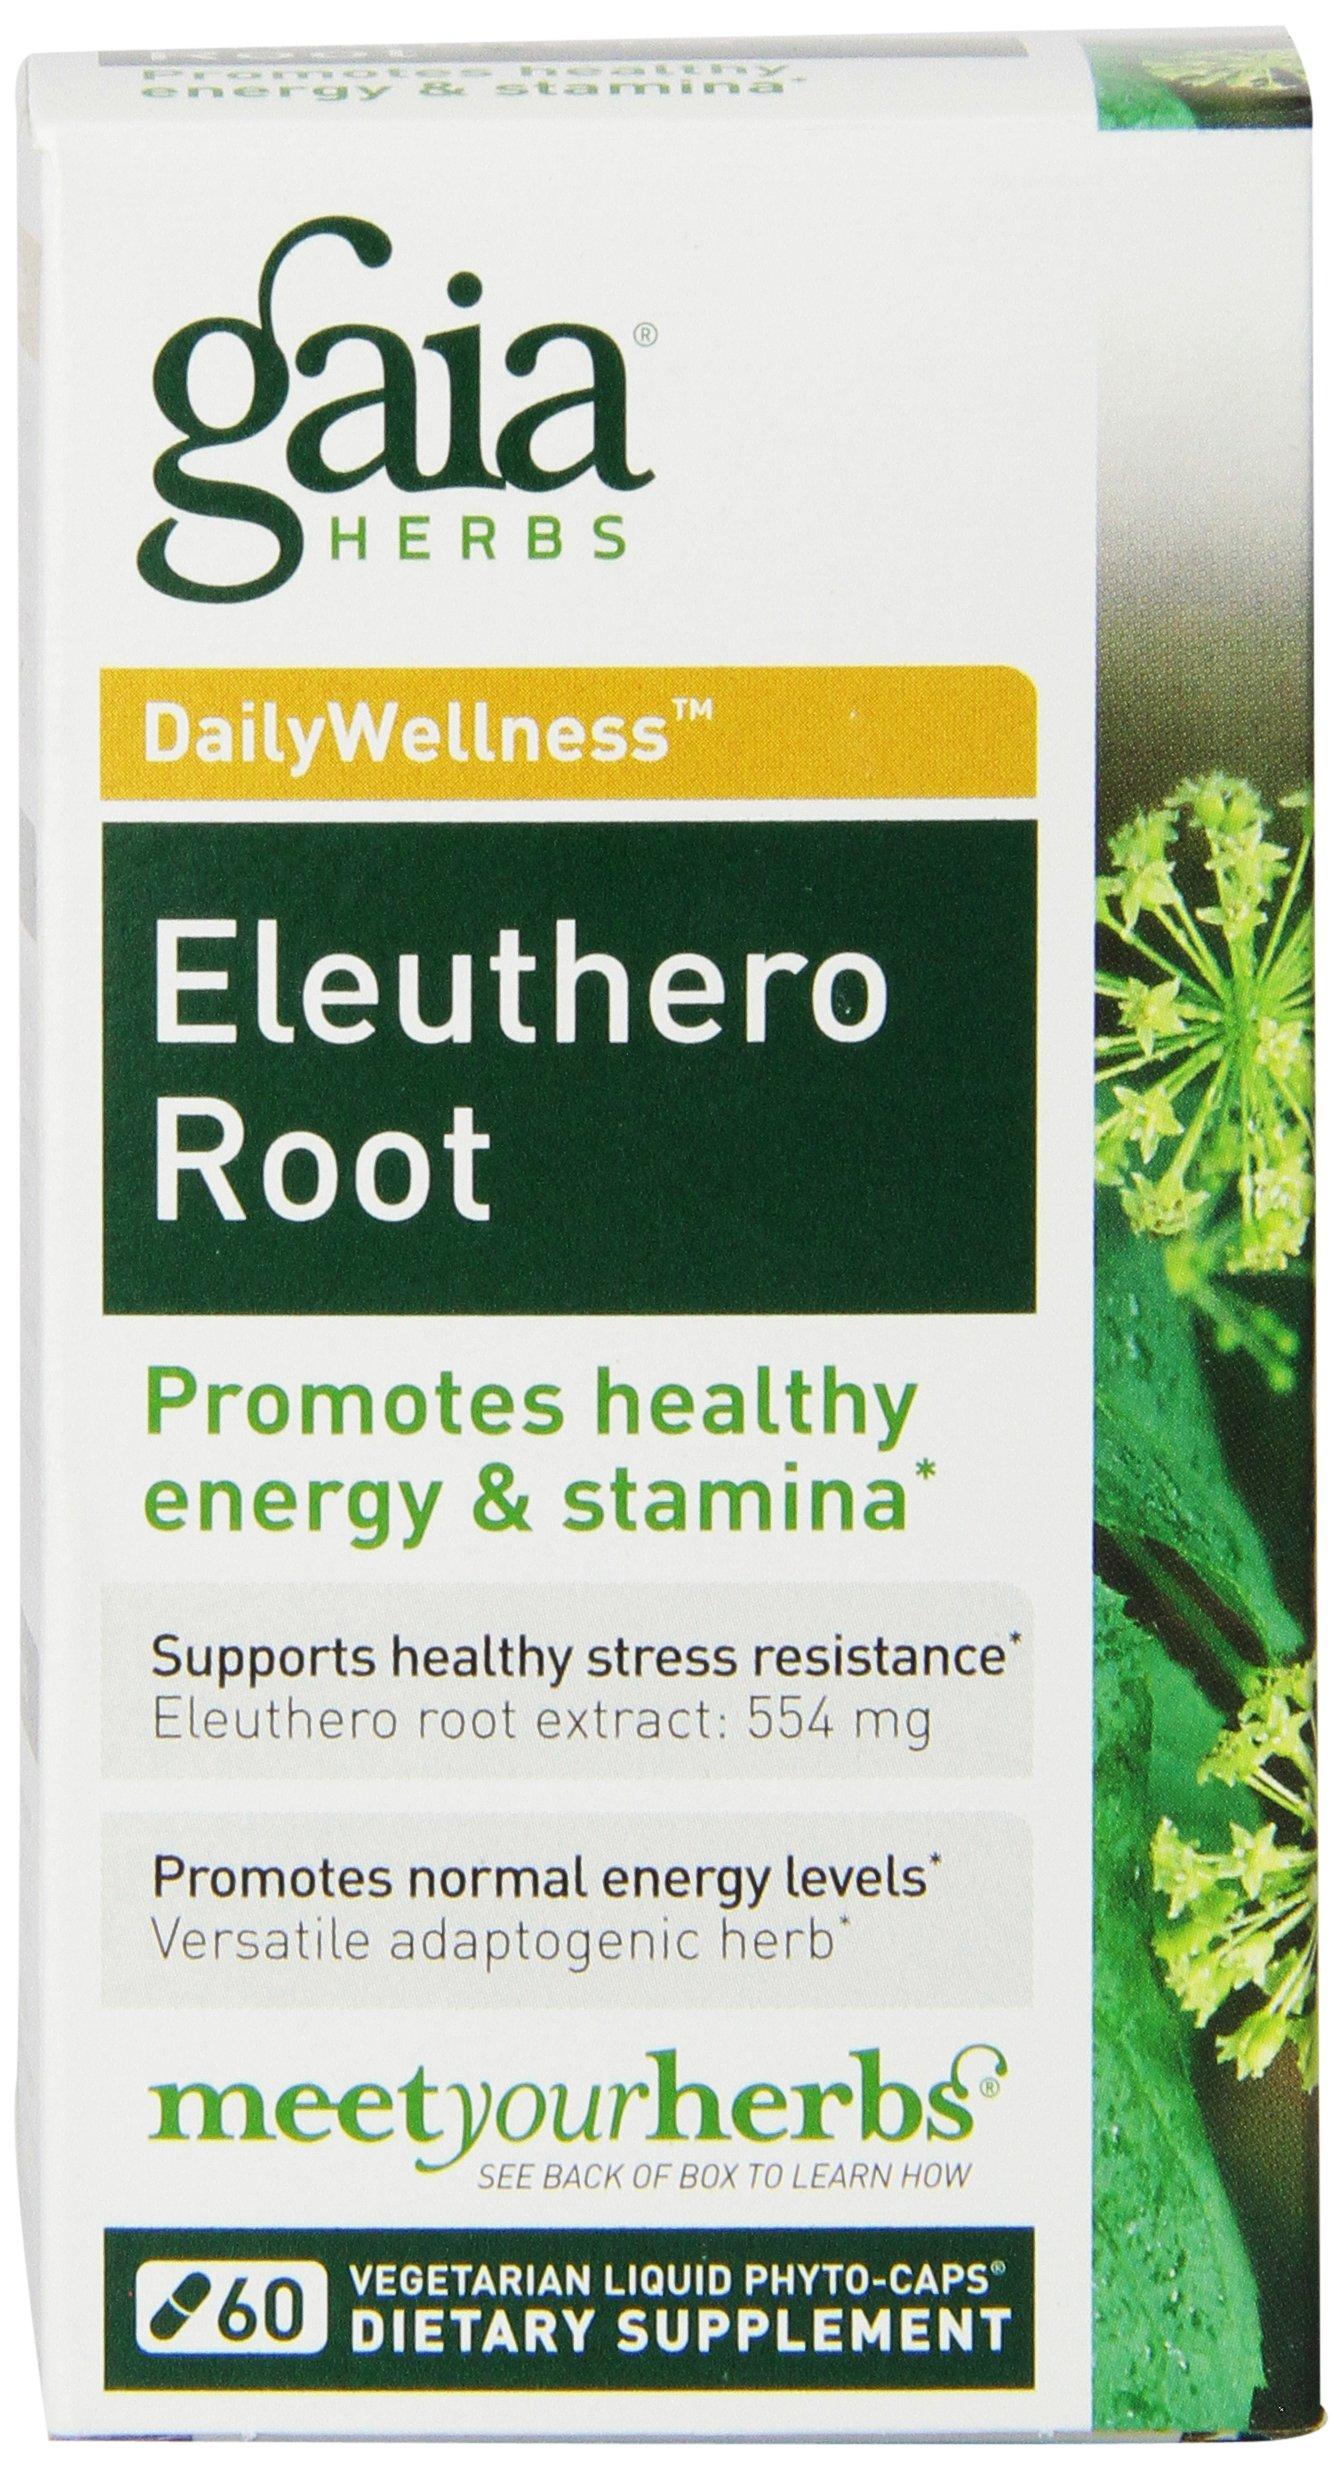 Gaia Herbs Eleuthero Root Liquid Phyto-Capsules, 60 Count